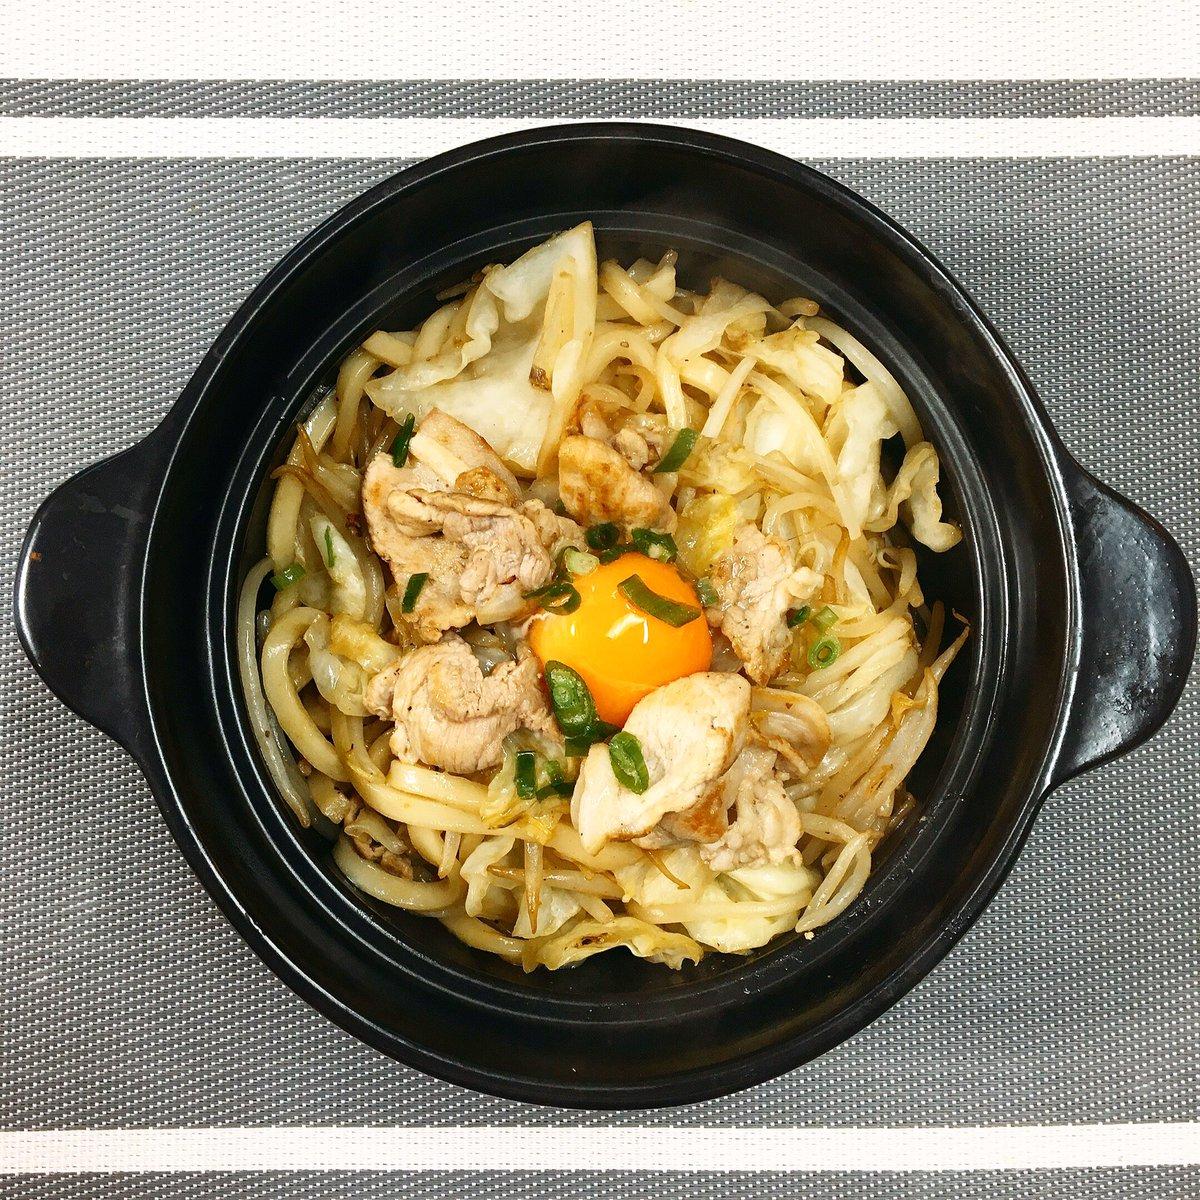 Nabeyakiudon morning🍲 やっきゅどん🙂  #breakfast #nabeyakiudon #noodles #japanesefood #healthyfood #鍋焼きうどん #うどん https://t.co/JgfTtDdHVE